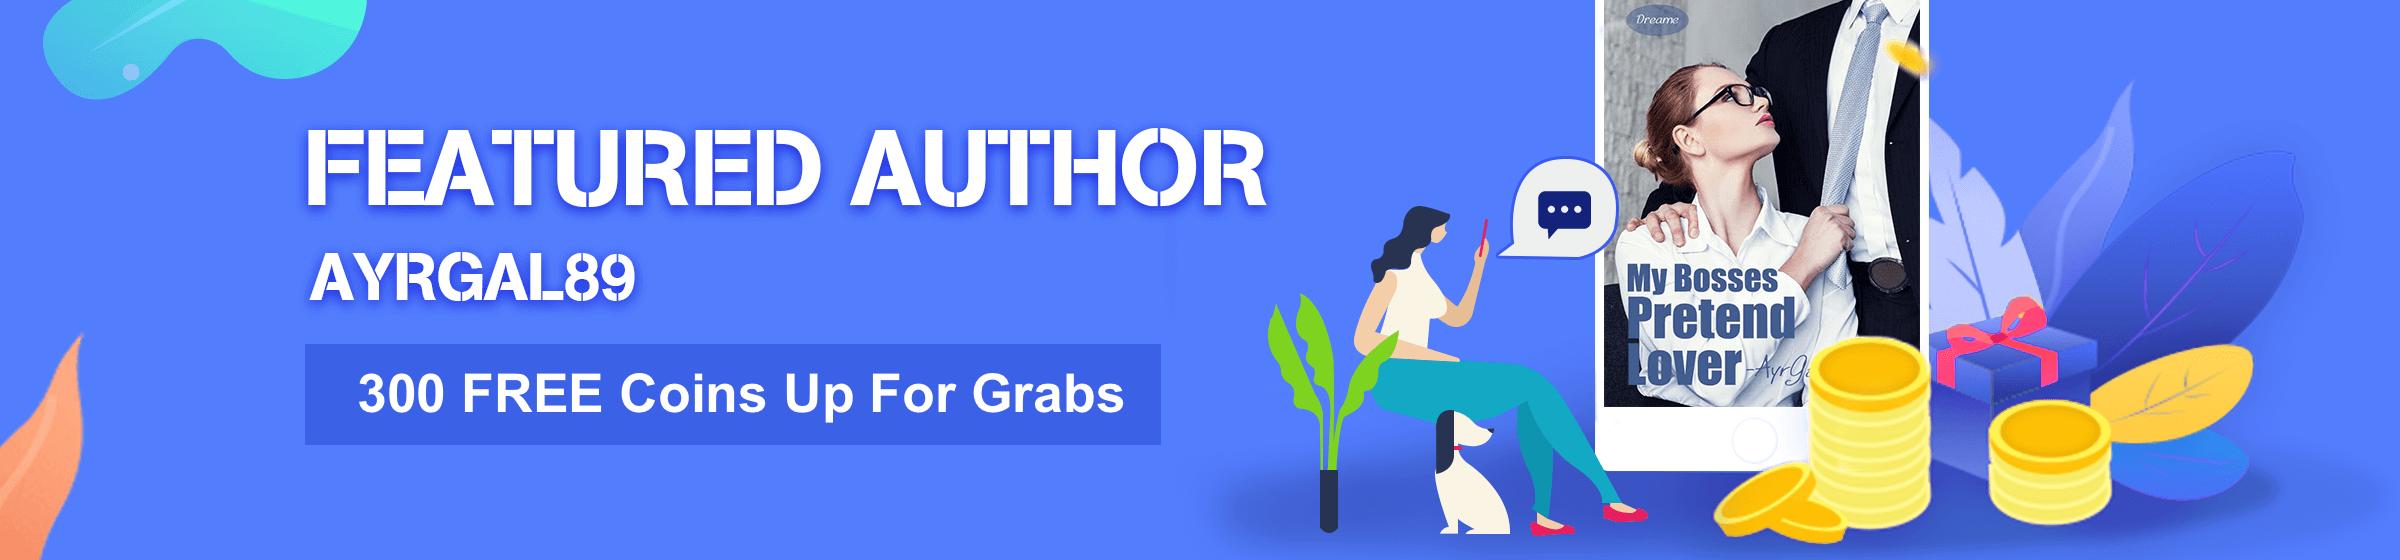 Featured-Author@#527efd@#527efd